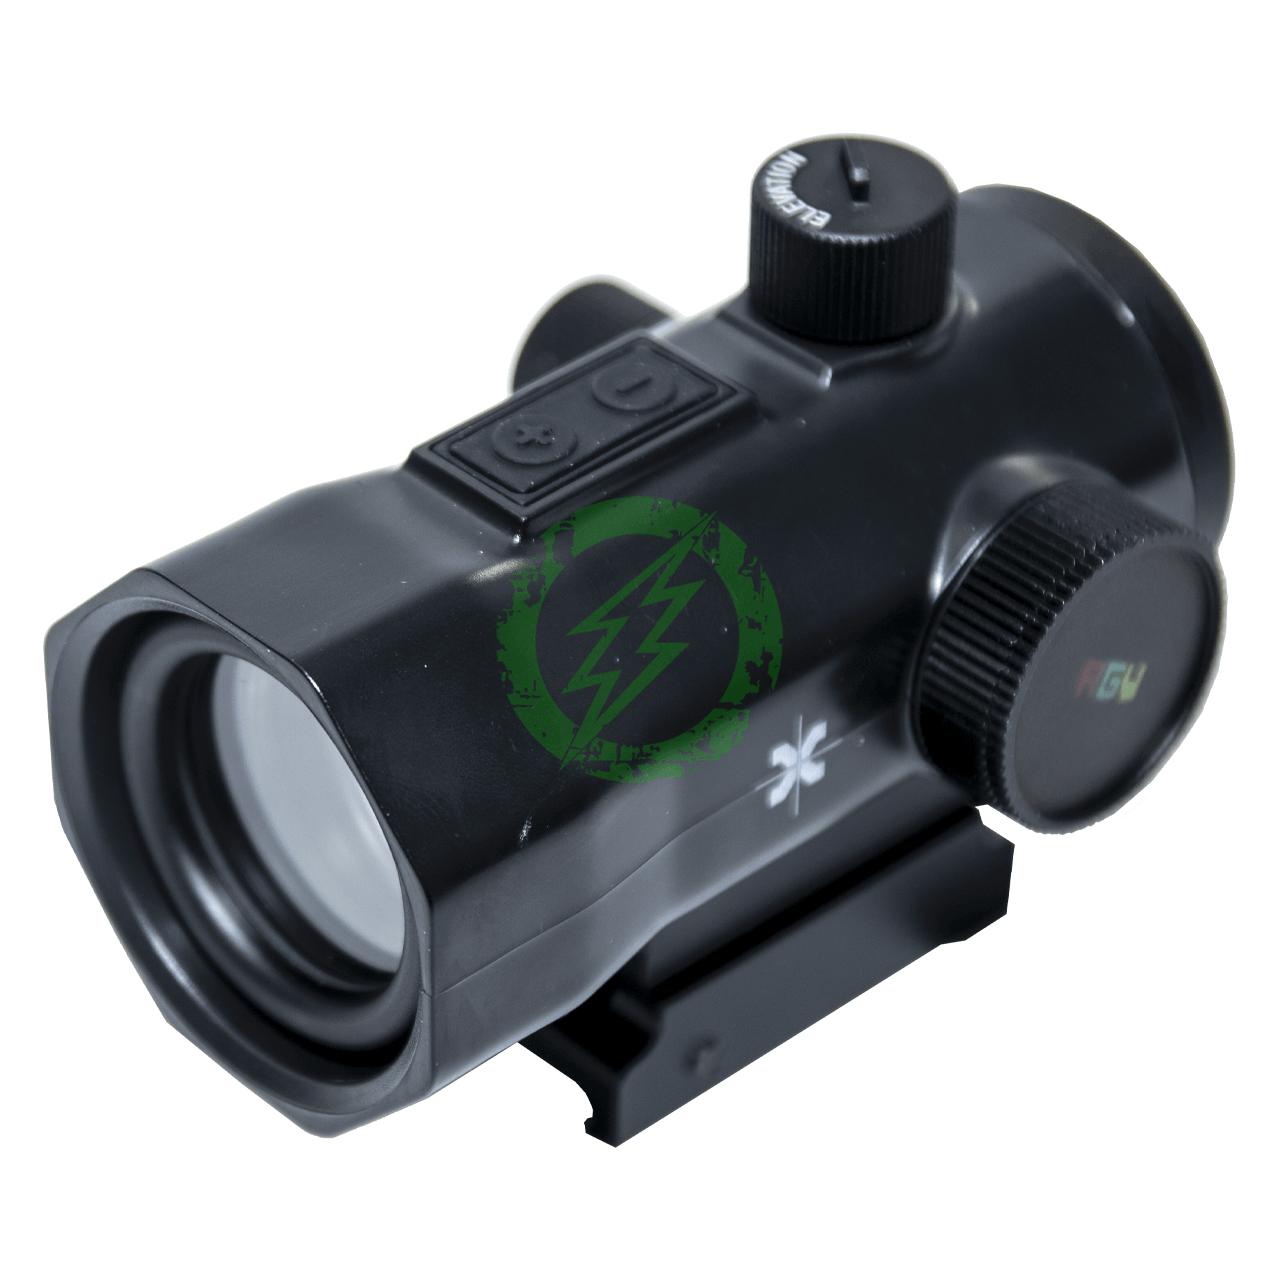 Umarex Axeon RGY Red-Green-Yellow Rifle Dot Sight